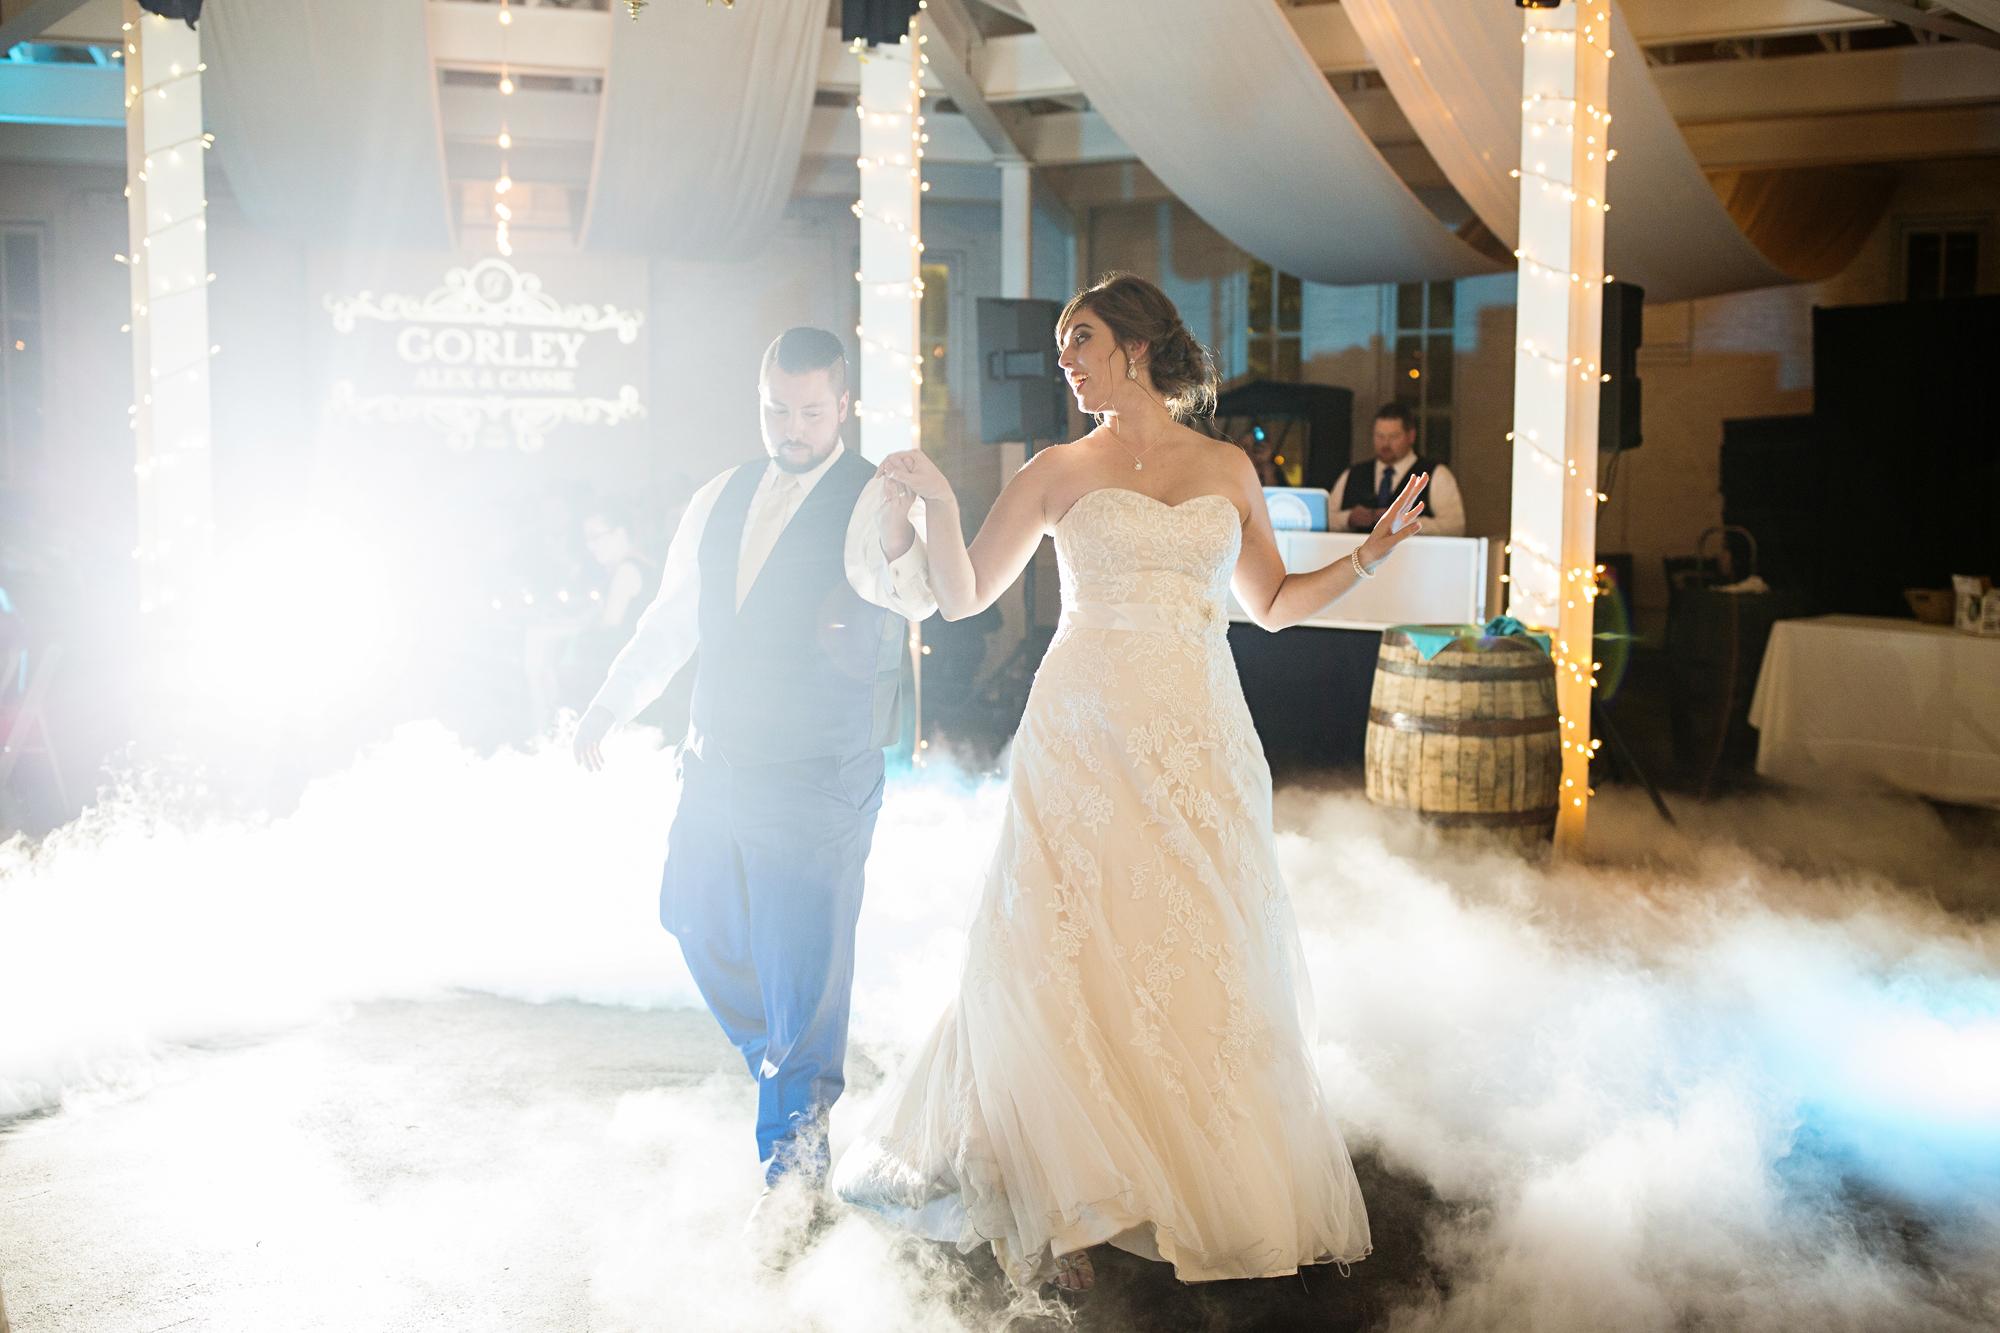 Seriously_Sabrina_Photography_Lexington_Kentucky_21c_Round_Barn_Red_Mile_Wedding_Gorley_112.jpg